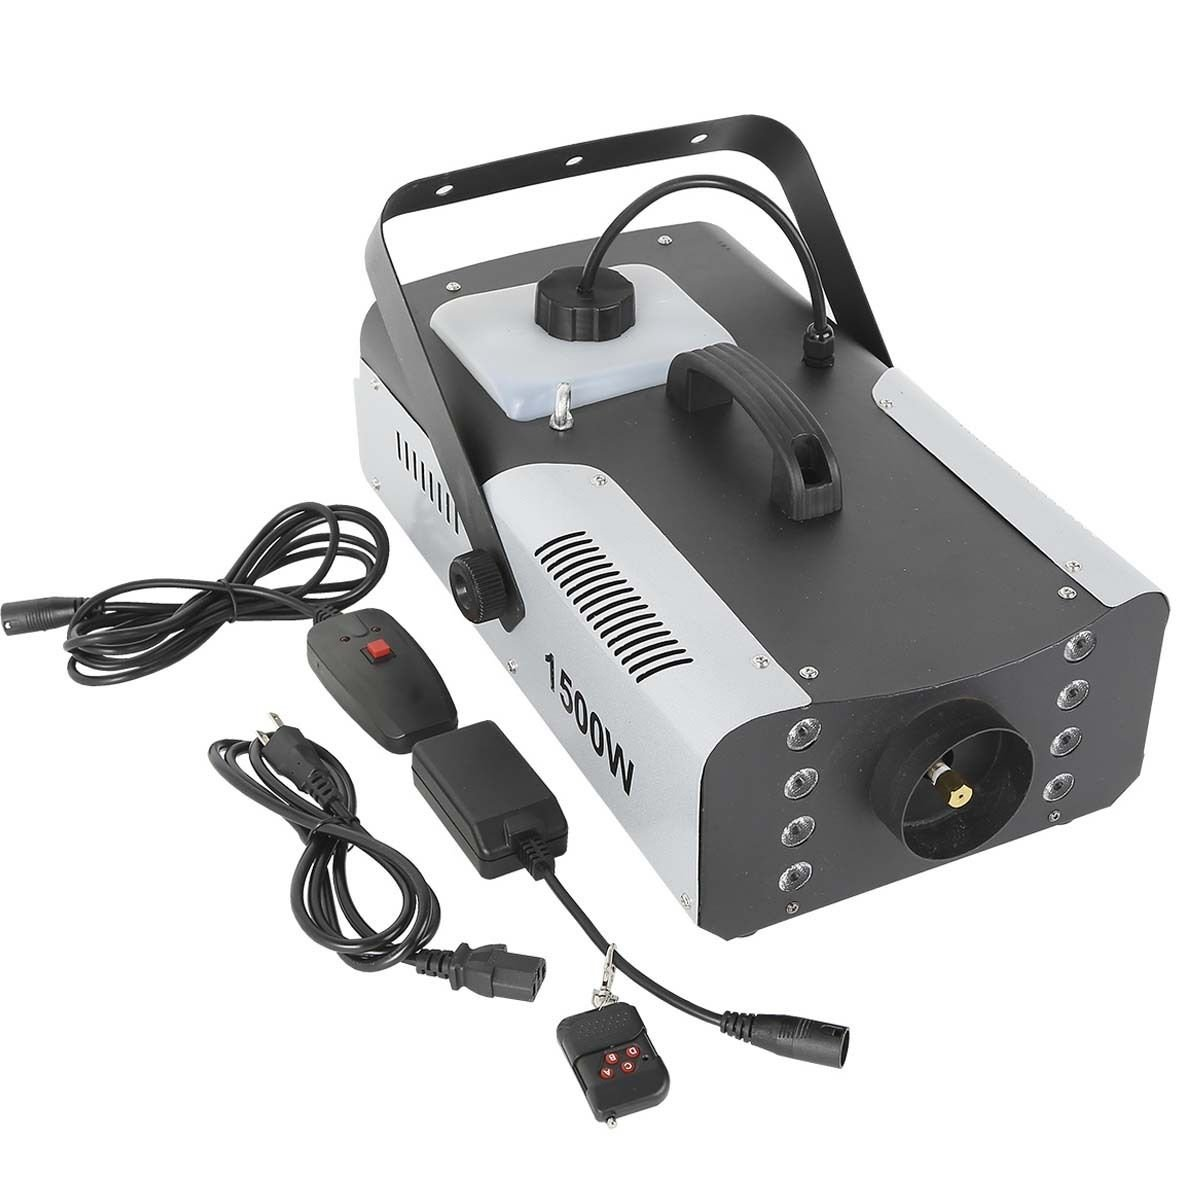 Tengchang 1500W Fog Machine RGB 3in1 8 LED DJ Stage Smoke Maker Wireless Remote (Style F)